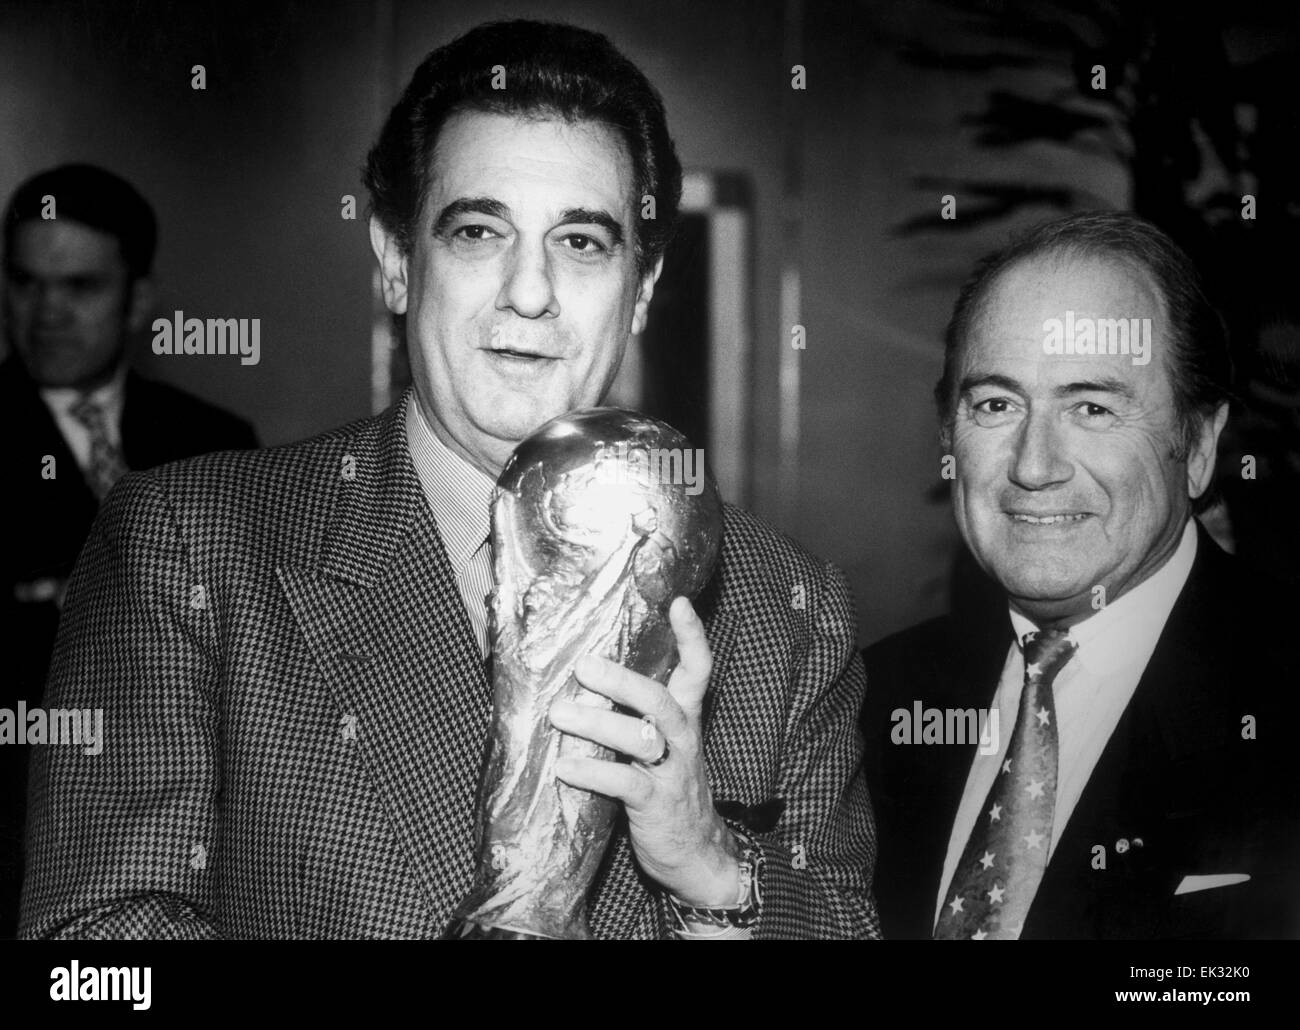 Switzerland. Spanish singer Placido Domingo L and President of FIFA Joseph Blatter. Reproduction. - Stock Image